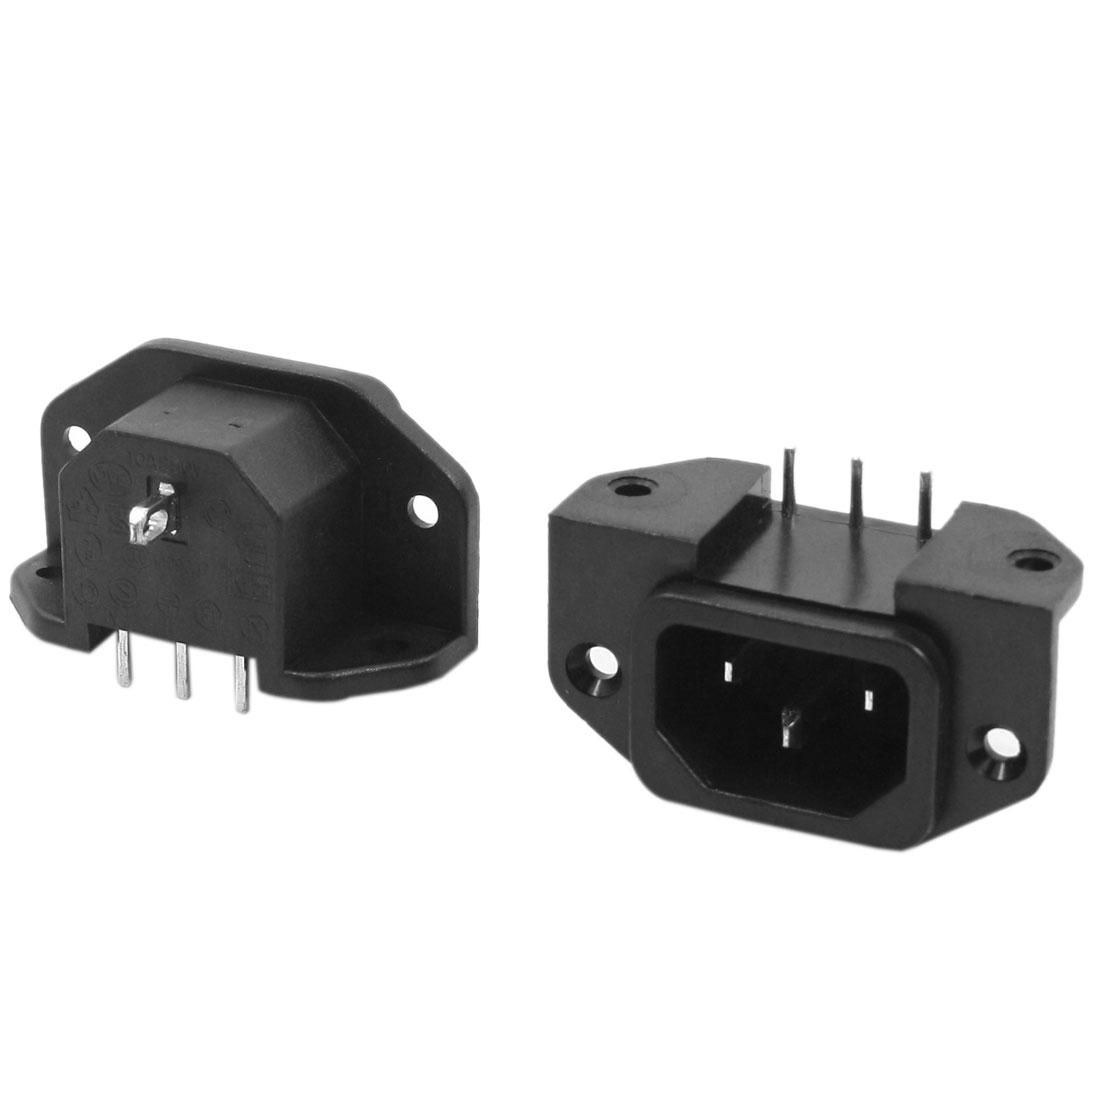 2 Pcs IEC320 C14 Inlet Welding Power Adapter Connector AC 250V 10A